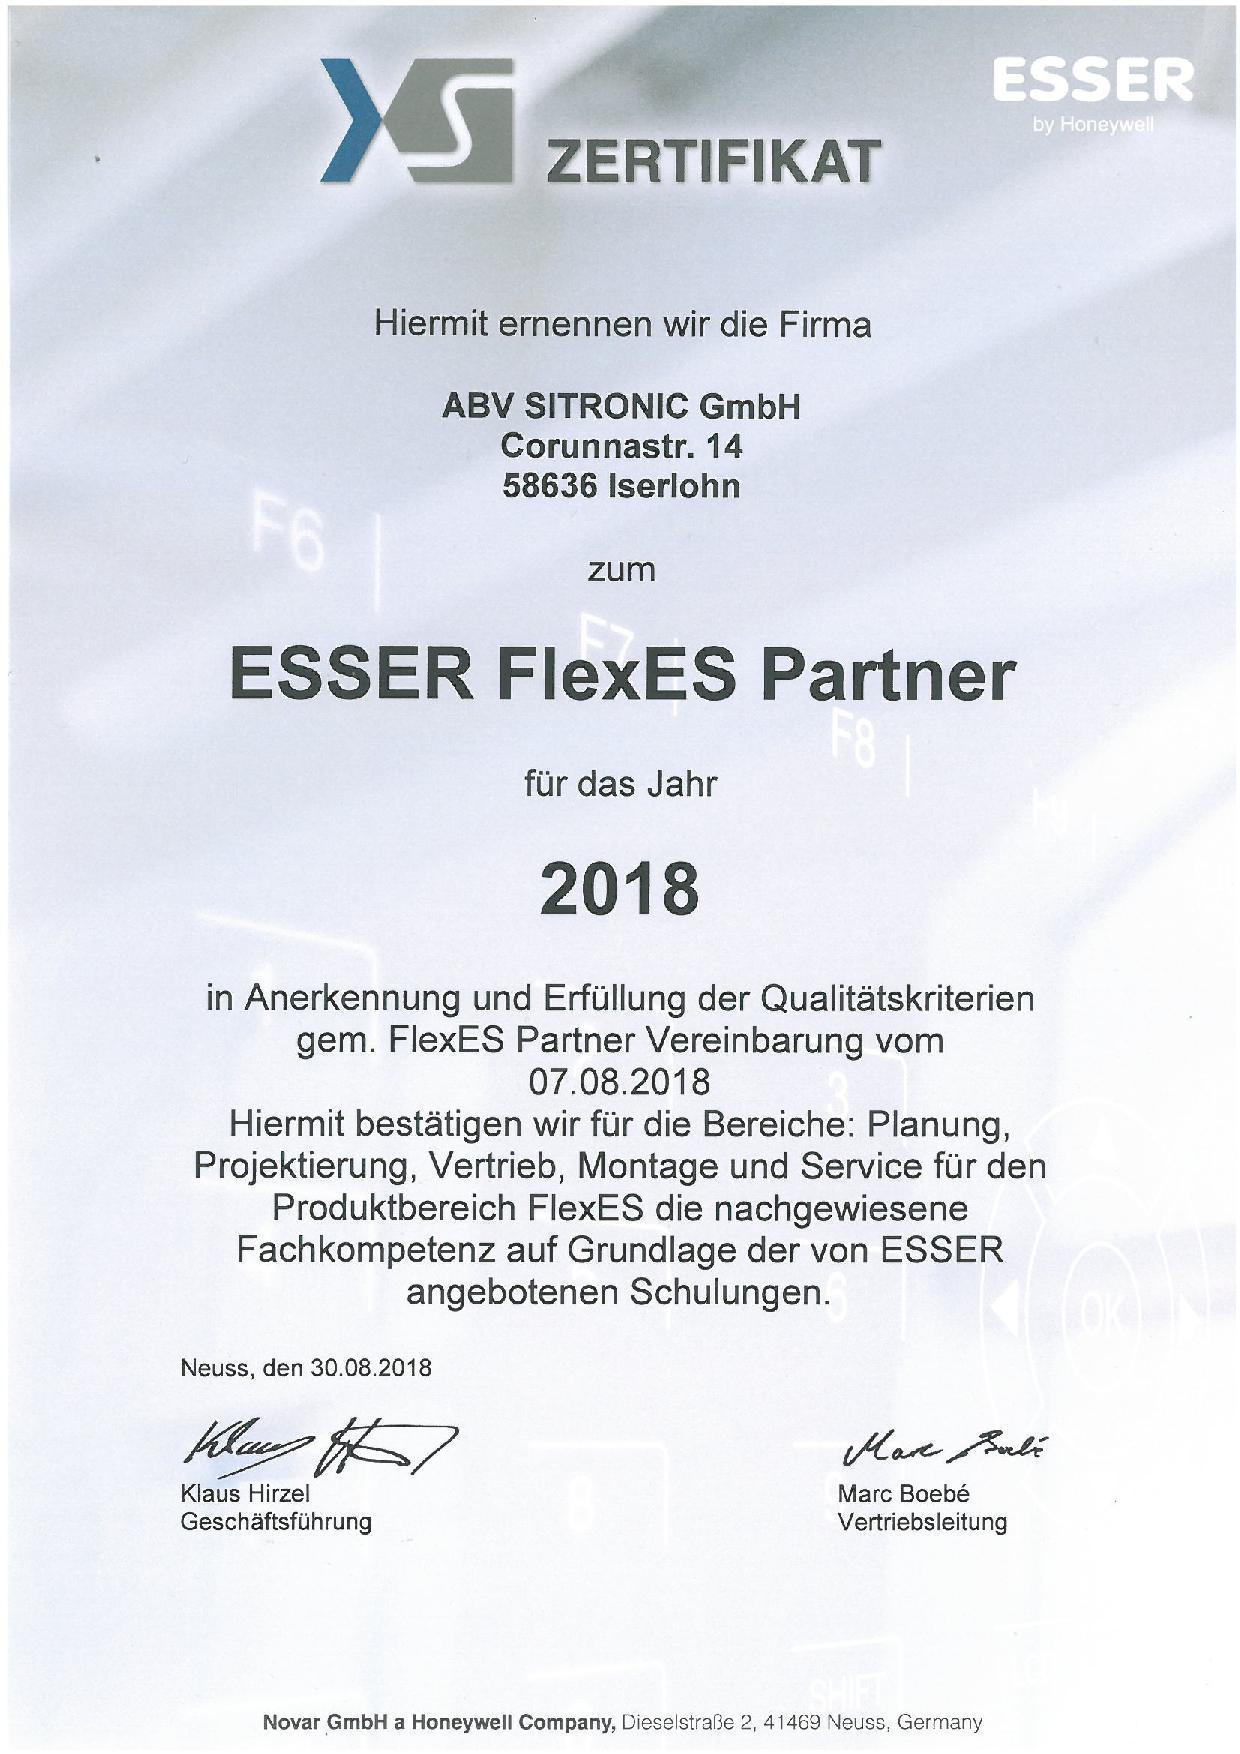 Esser FlexES (SITRONIC Iserlohn)